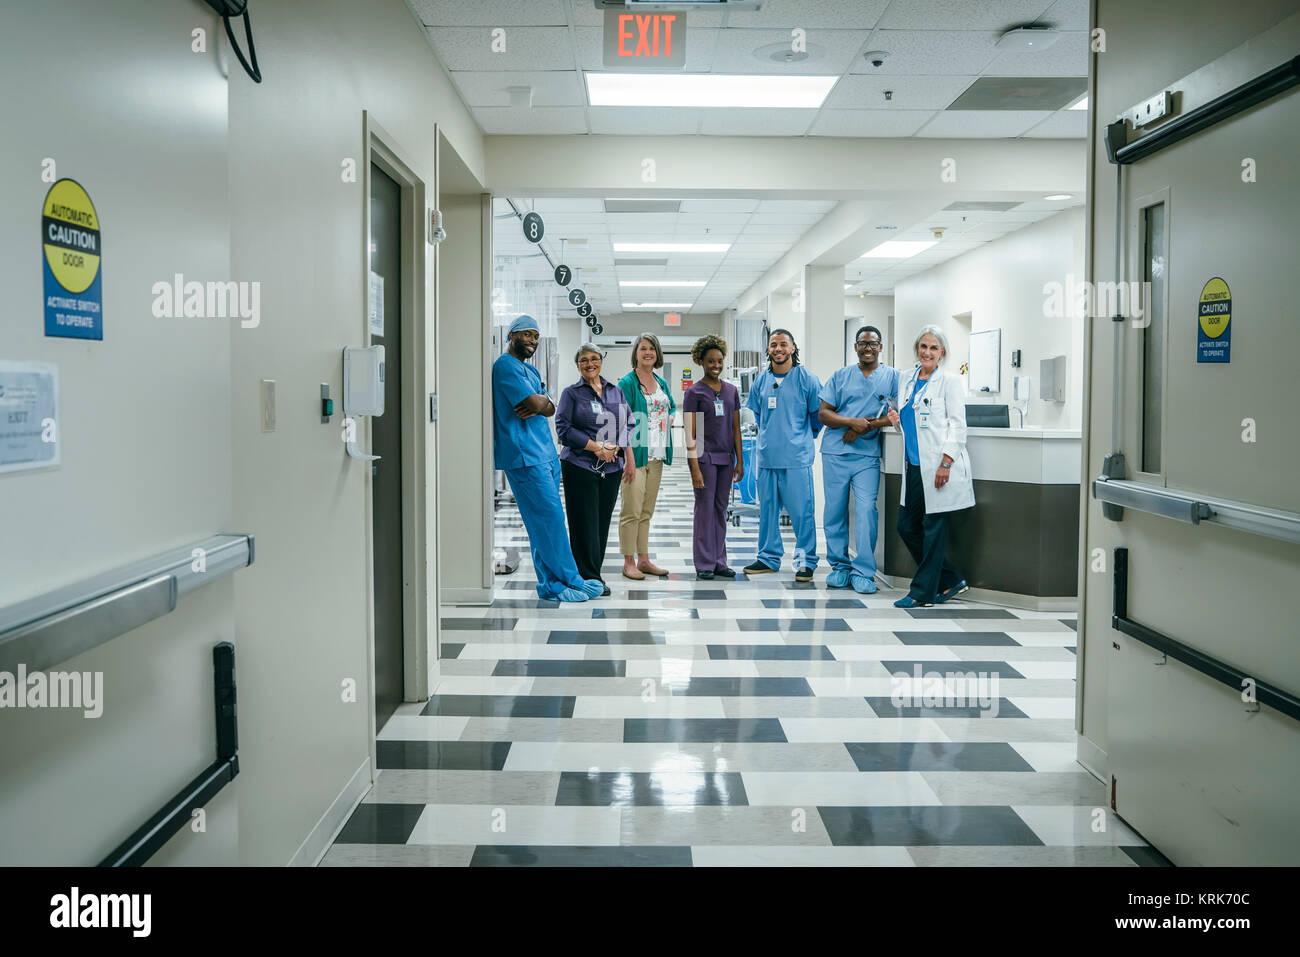 Portrait of medical team in hospital - Stock Image